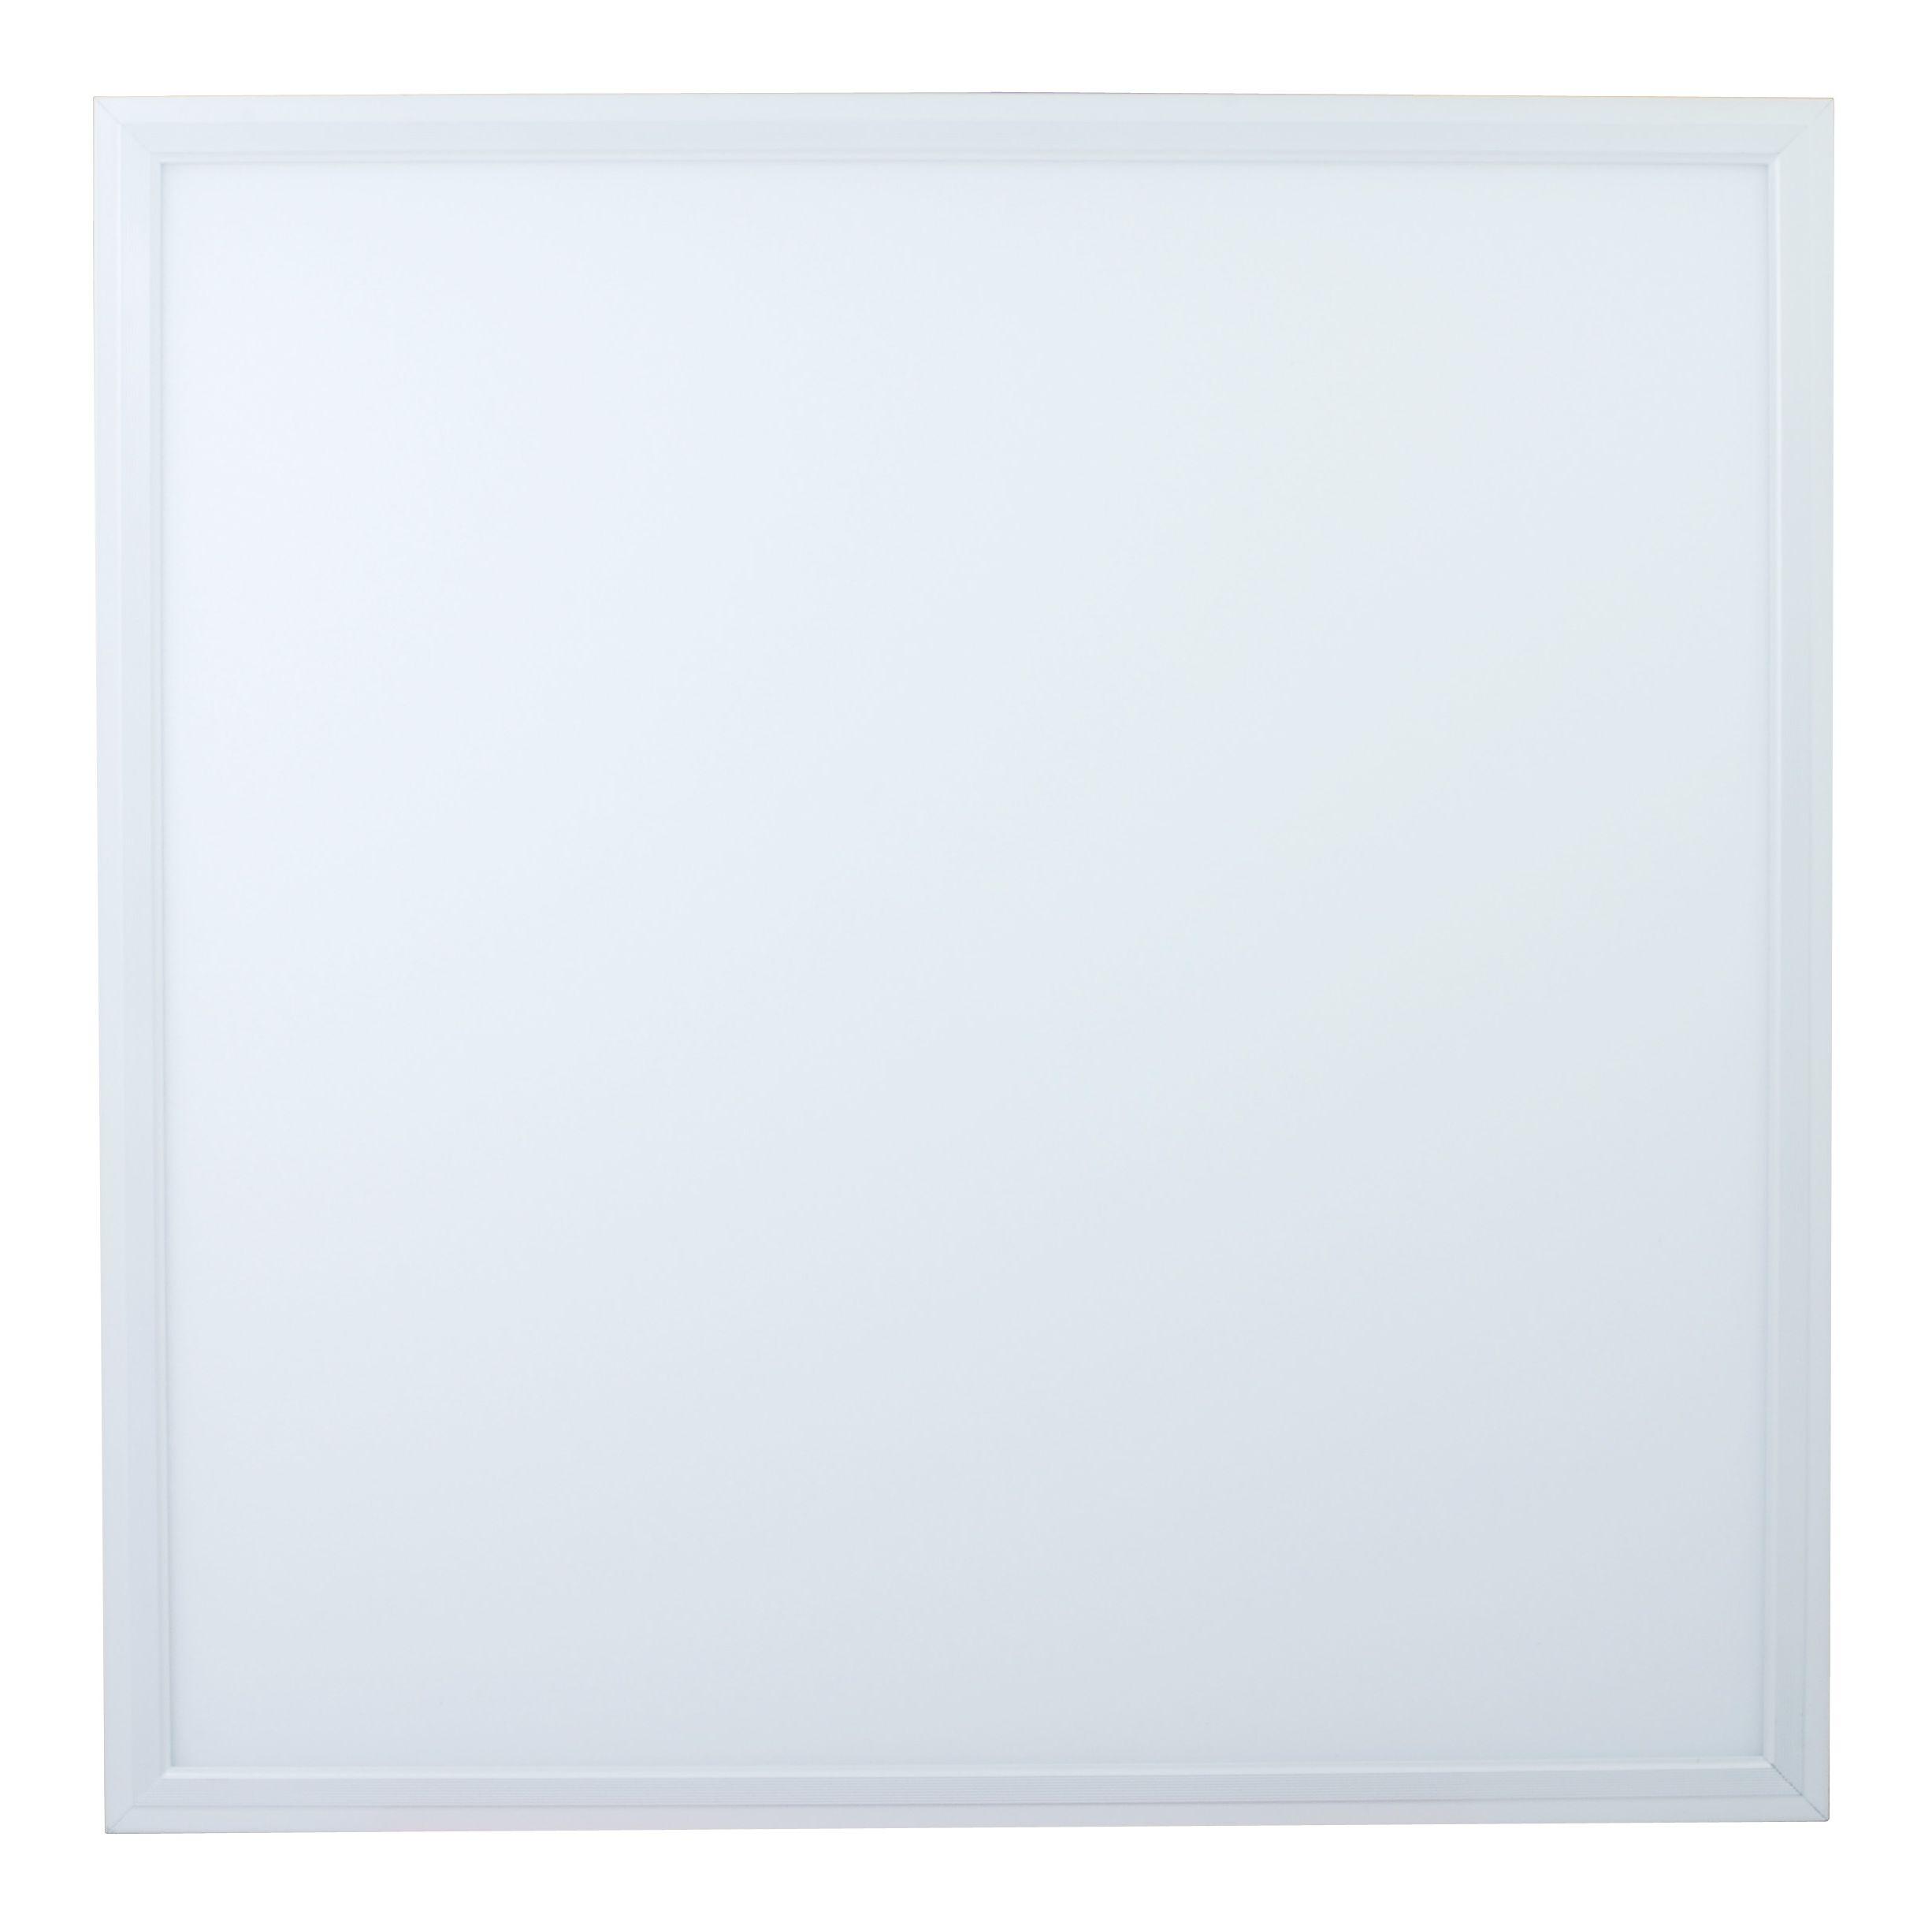 Greenlux Biely podhľadový LED panel 600 x 600mm 40W Economy - BEZ OBALU - POSLEDNÝ KUS